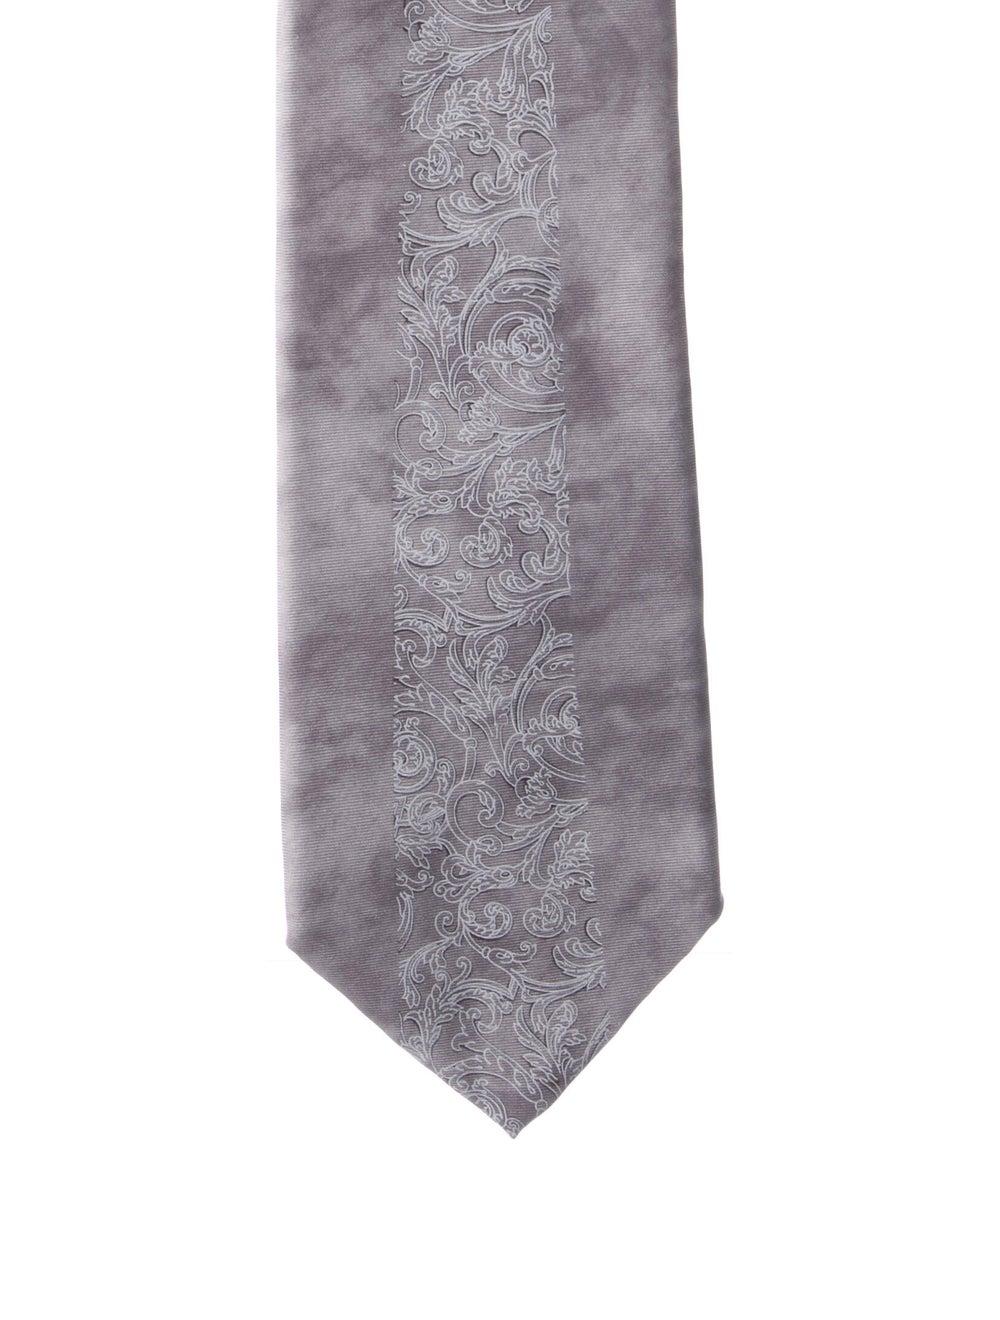 Gianni Versace Silk Printed Tie grey - image 1